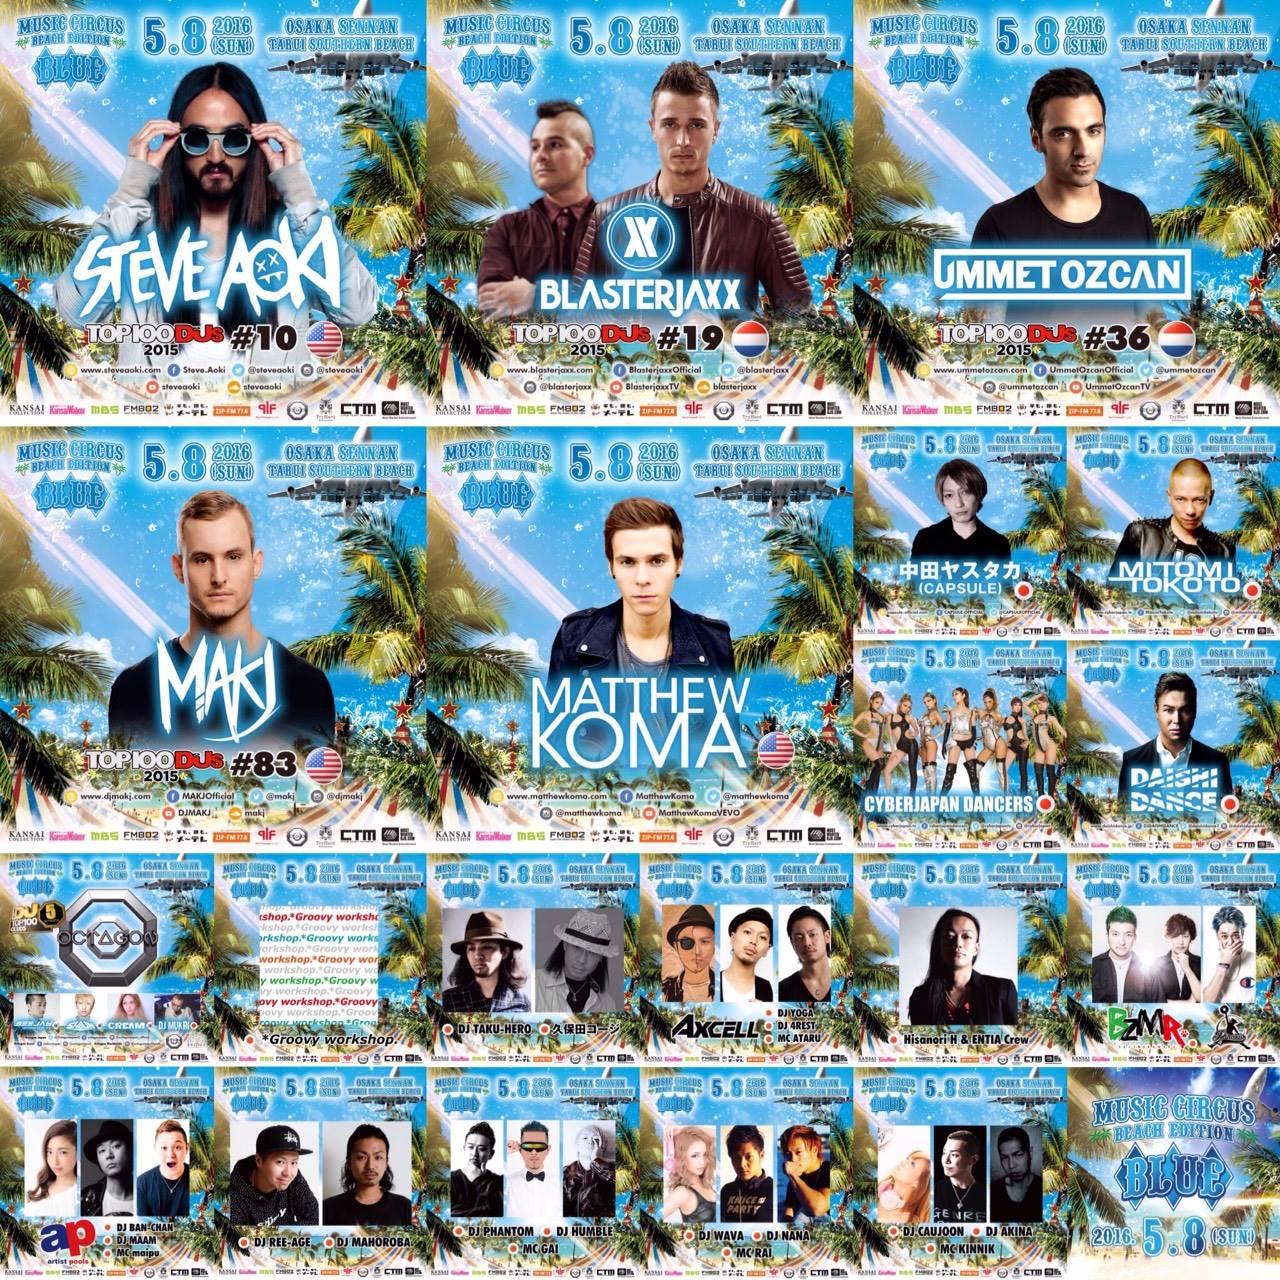 MUSIC CIRCUS 2016 lineup